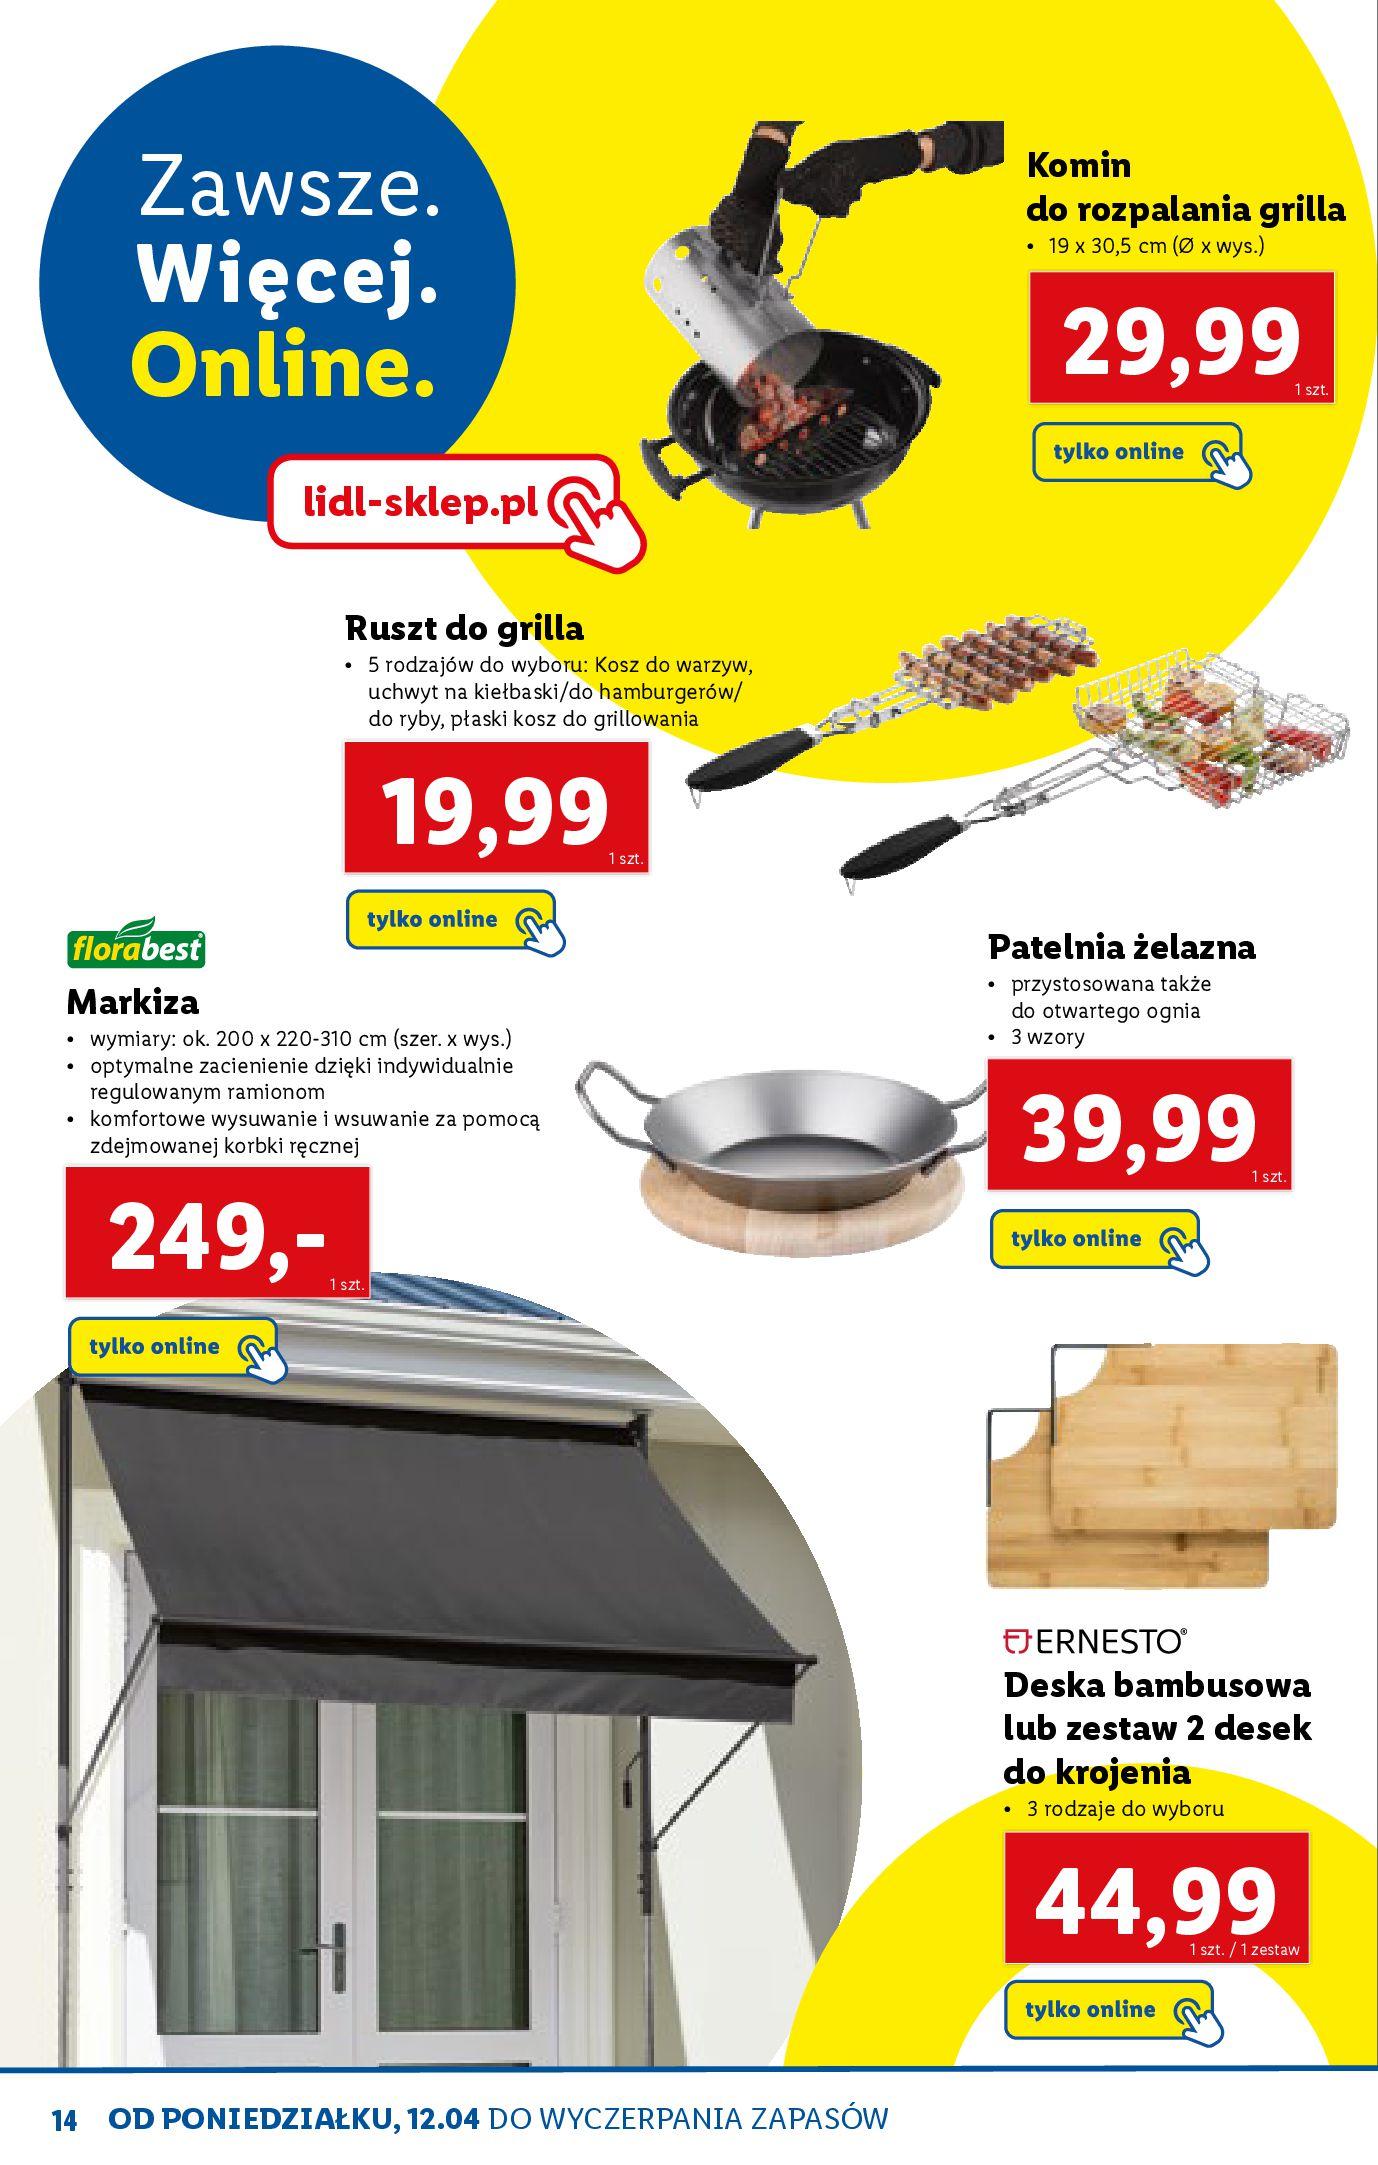 Gazetka Lidl: Katalog ONLINE - Rekreacja 2021-04-07 page-14